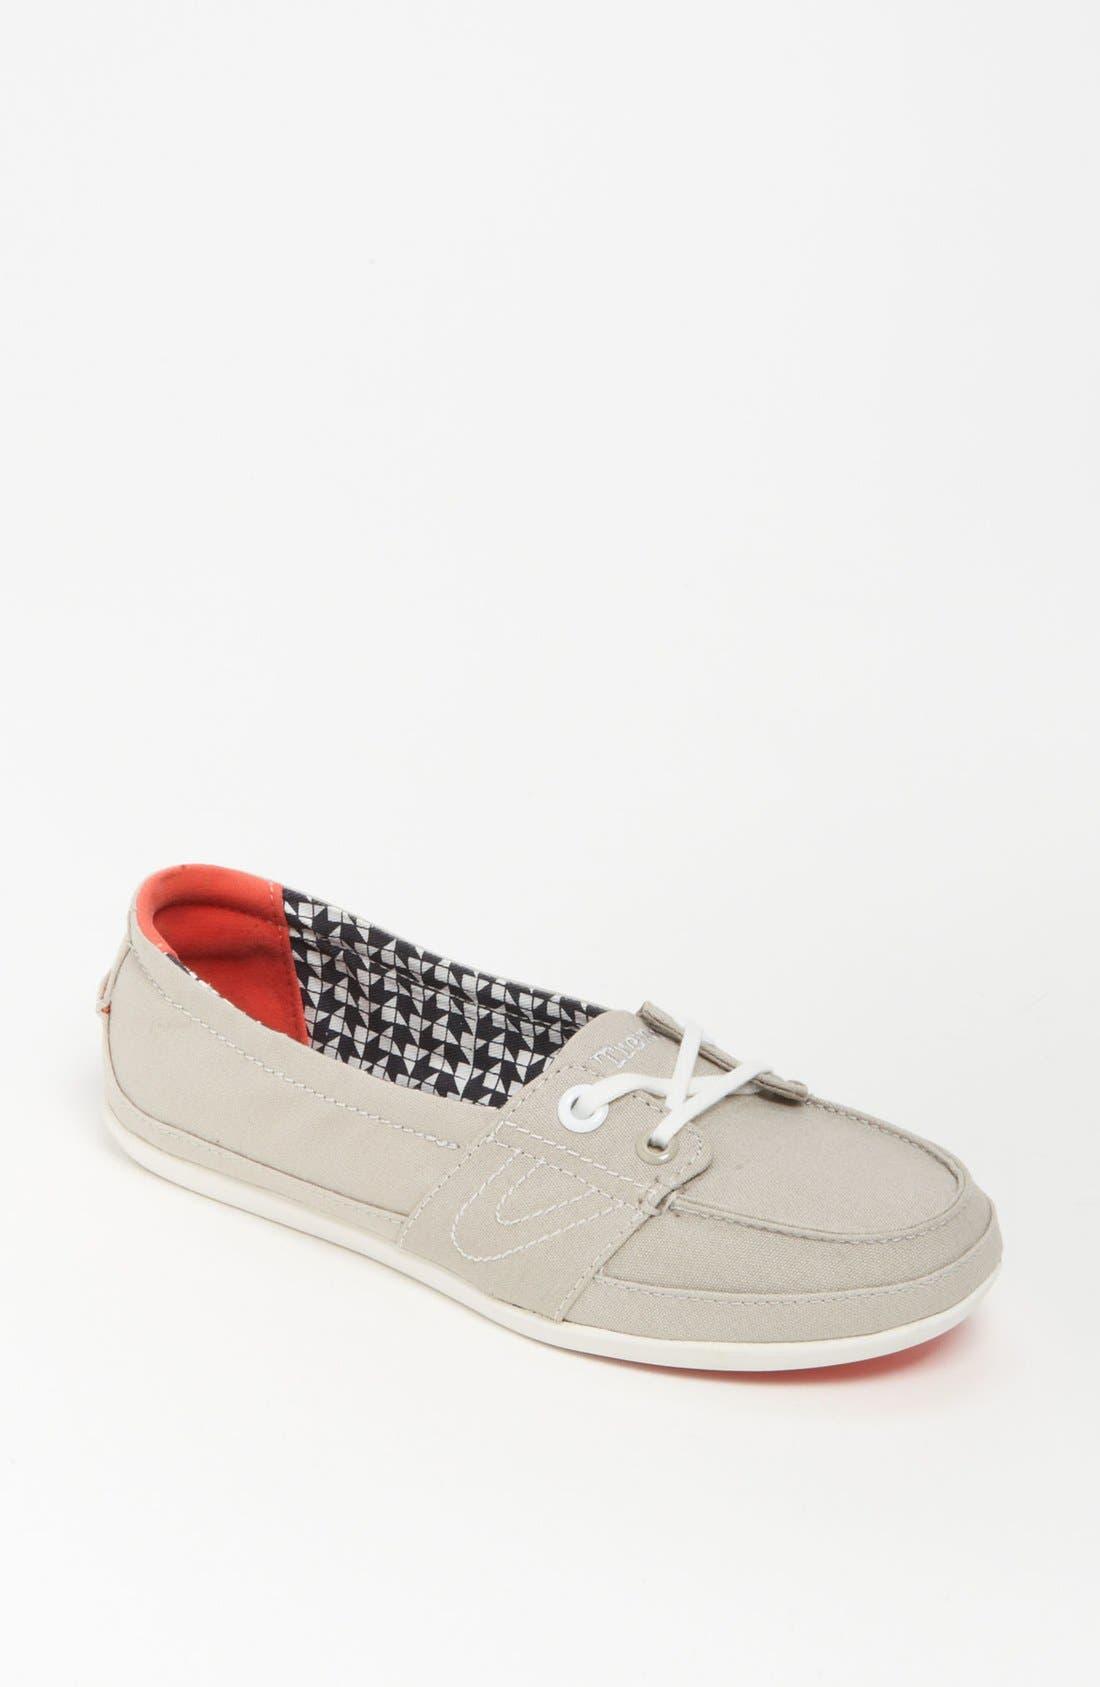 Main Image - Tretorn 'Signe' Sneaker (Women)